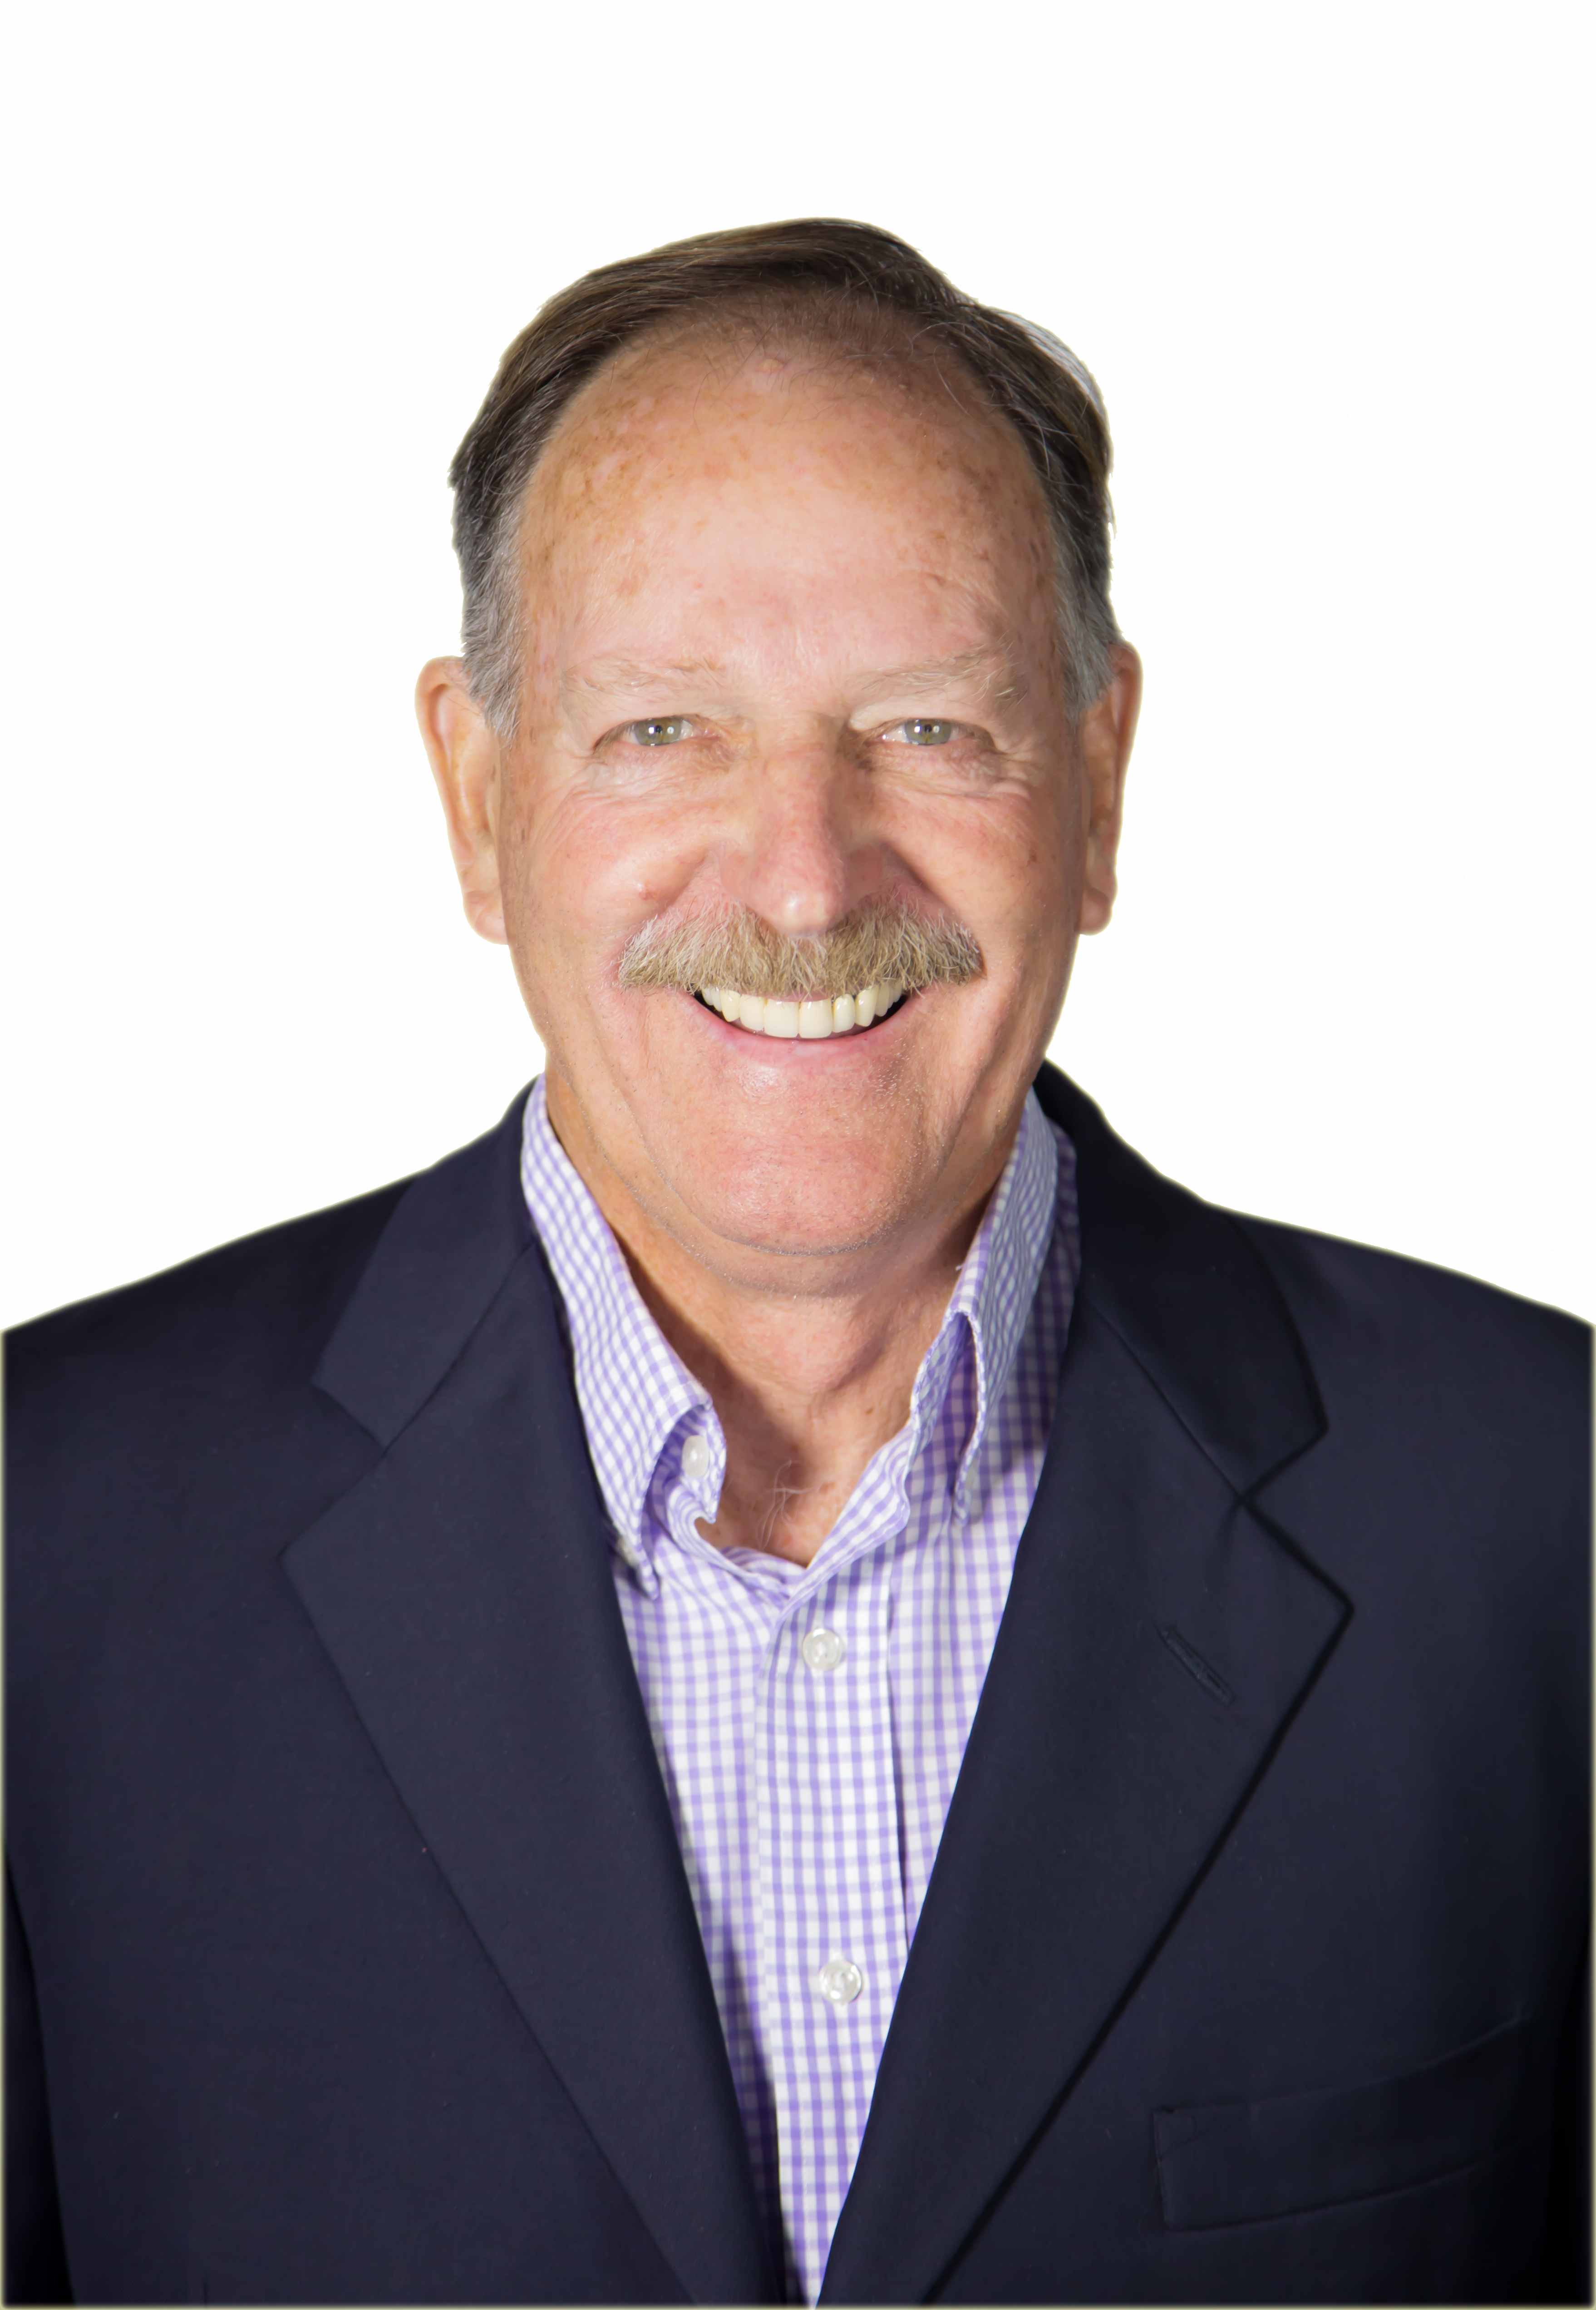 Wayne Beckley Merlot Skin Care CEO